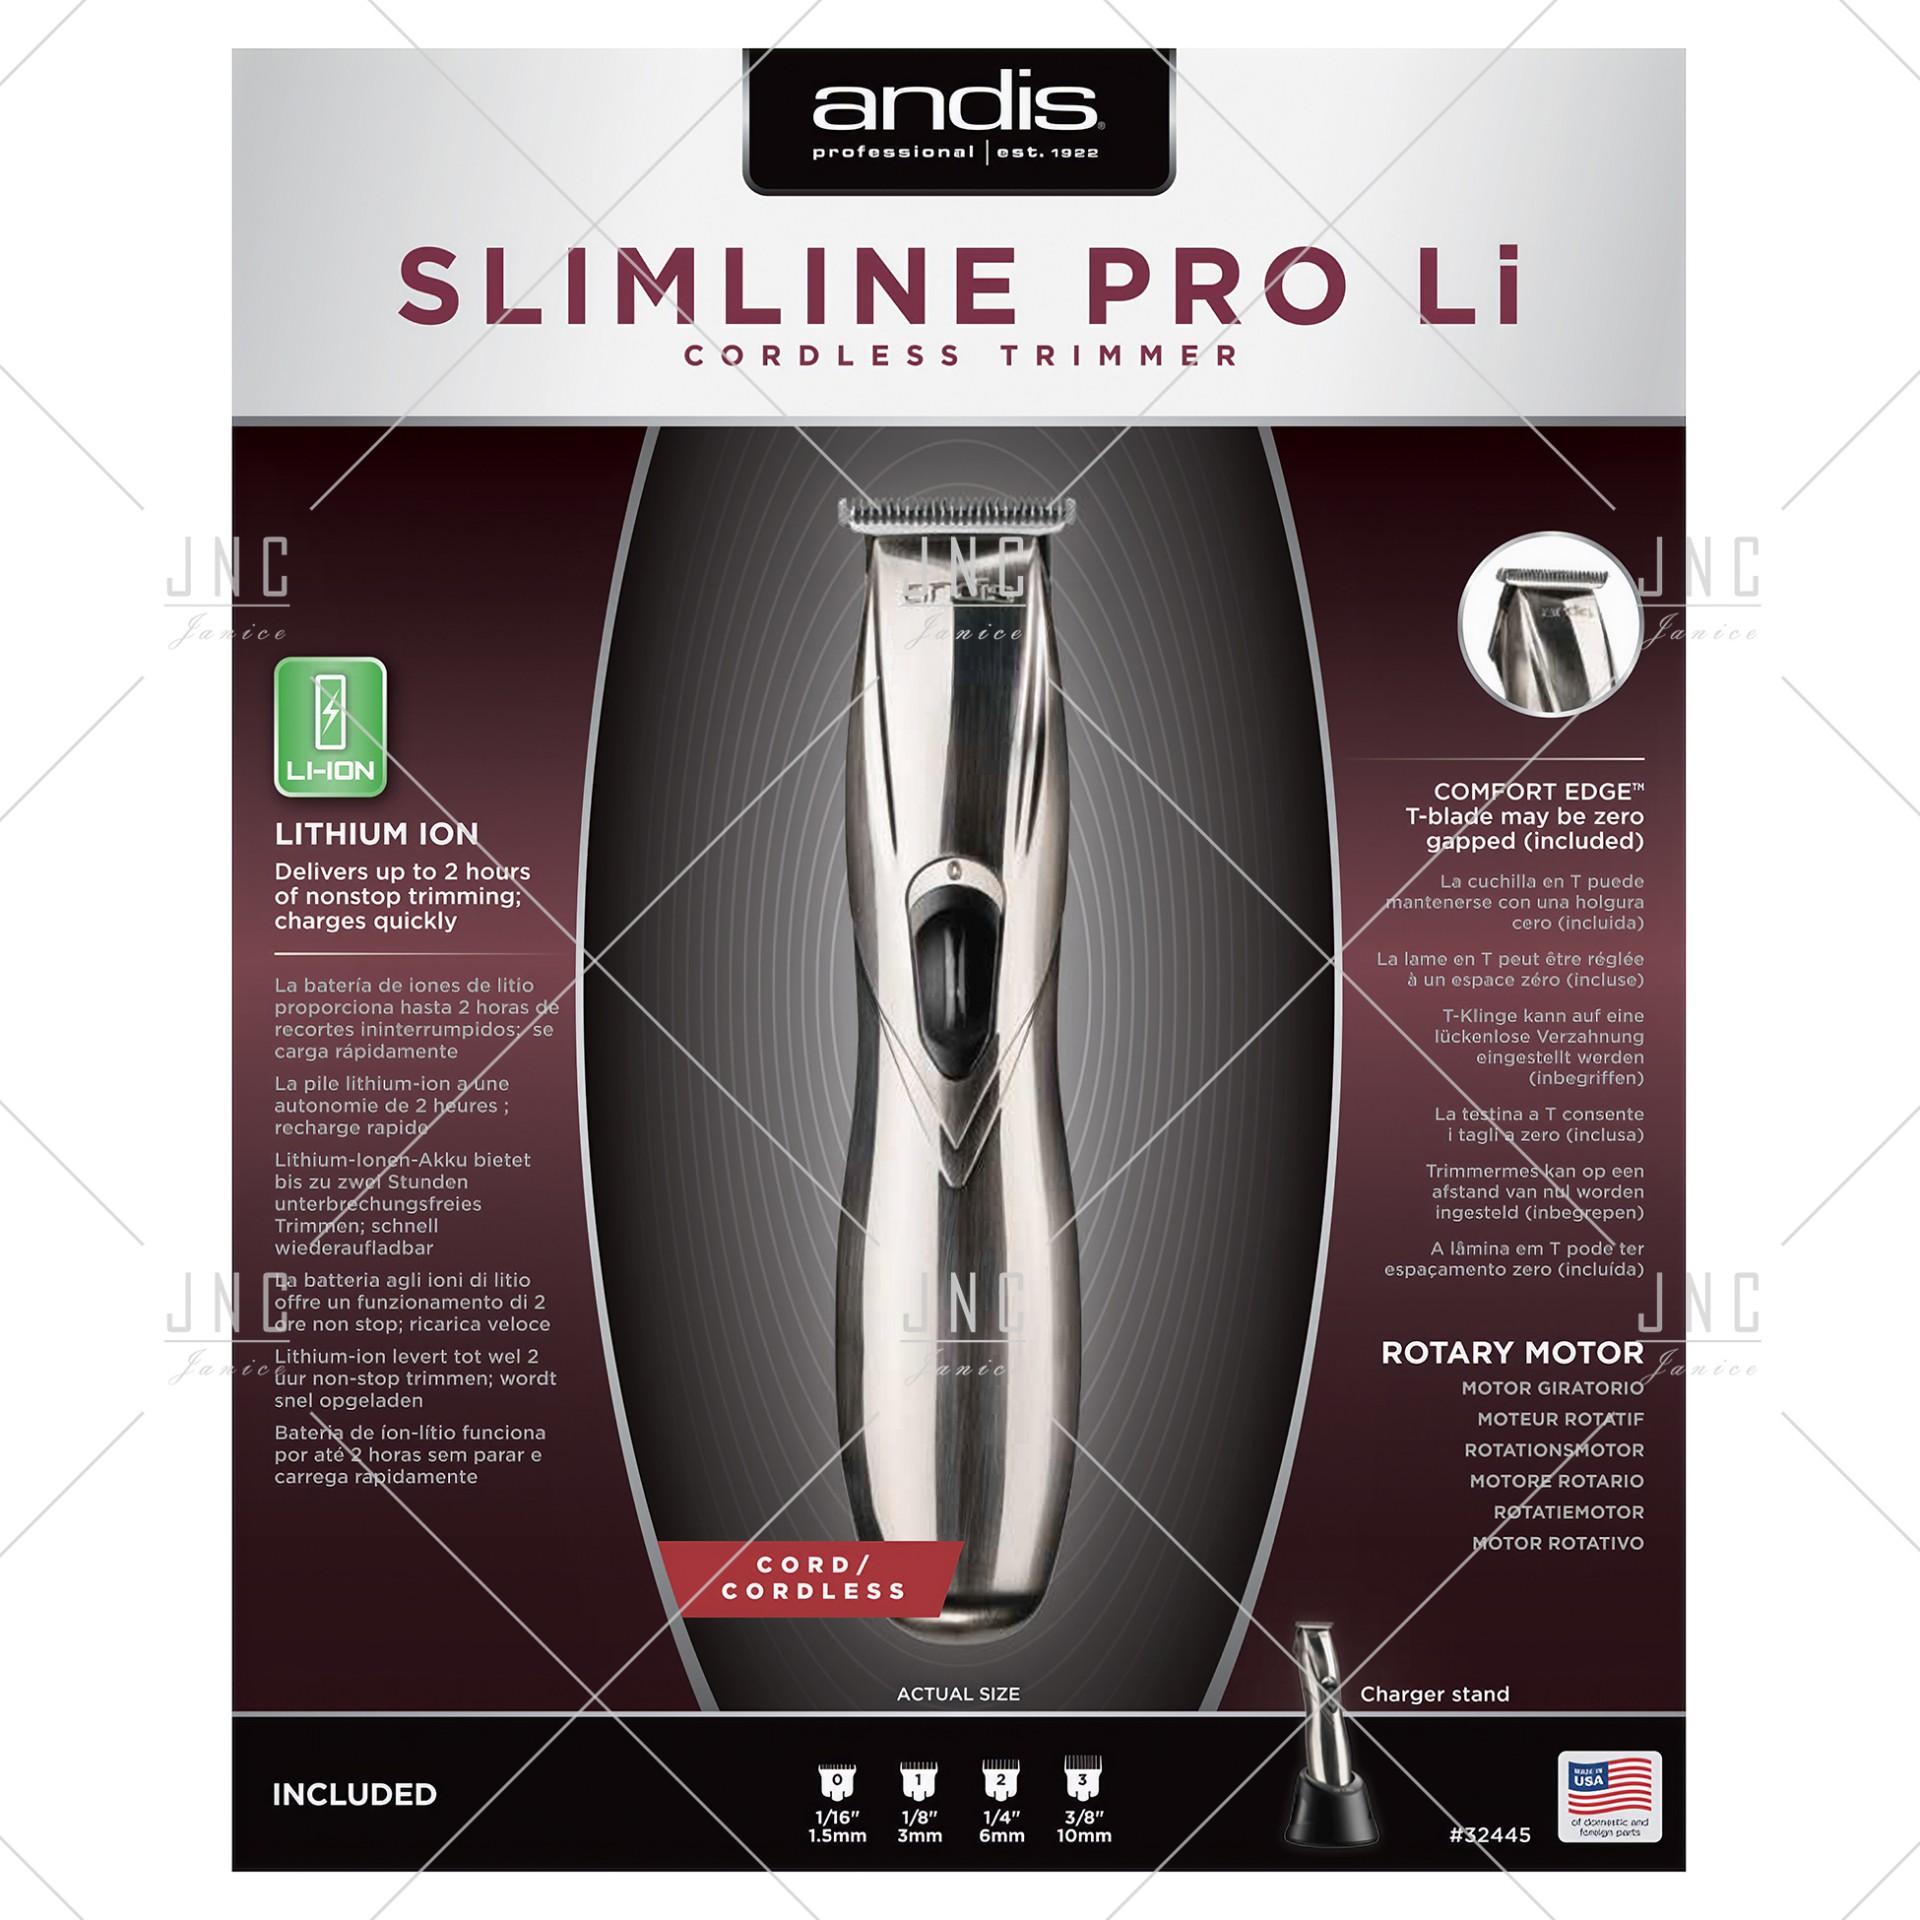 Máquina Andis Slimline® Pro Li T-Blade Trimmer | REF.A32445